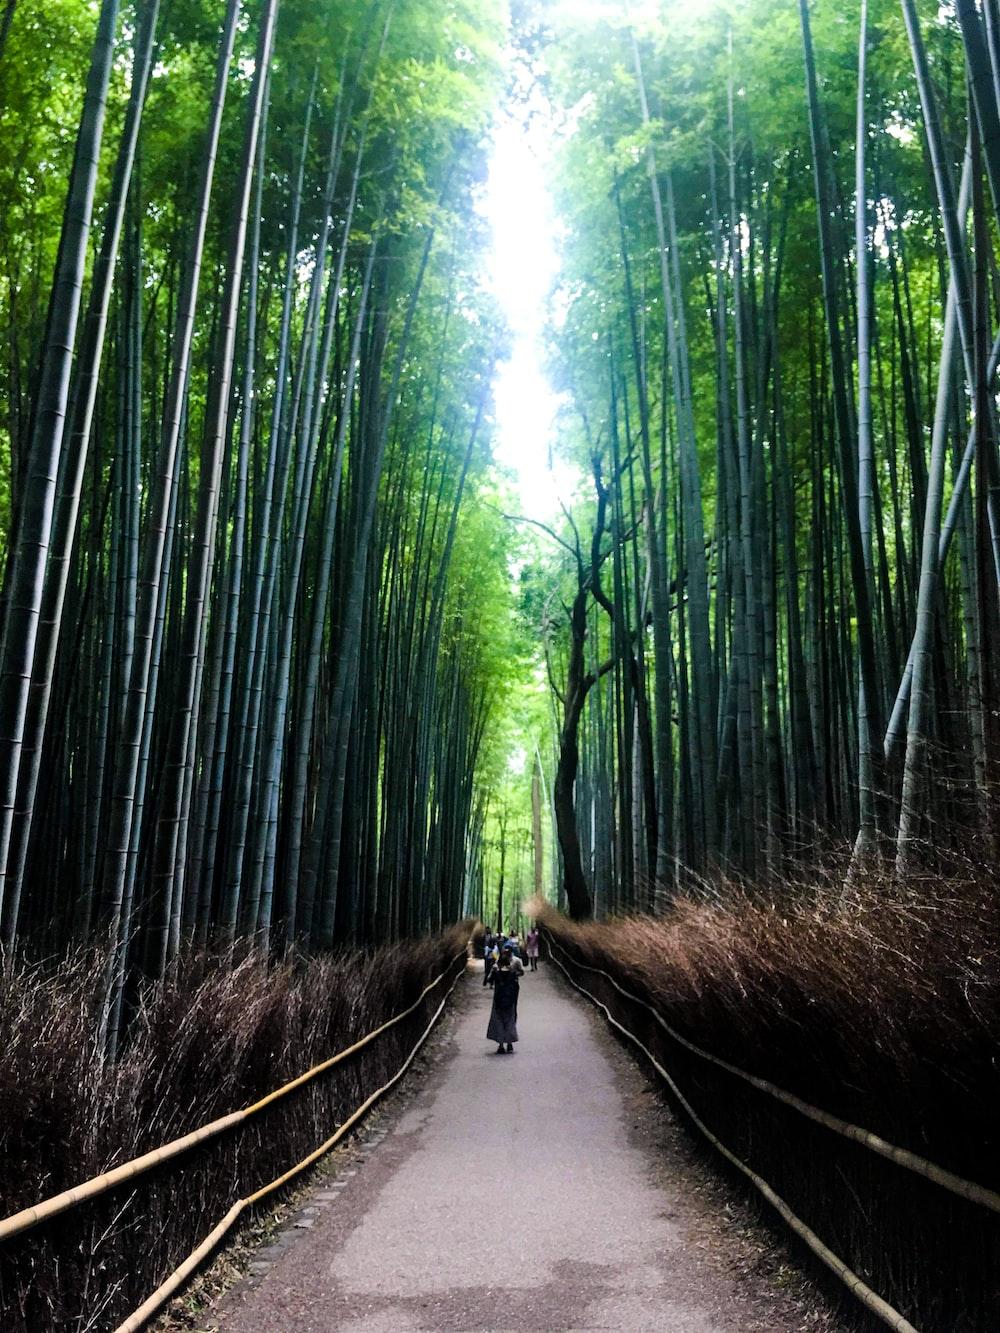 man in black jacket and black pants walking on pathway between bamboo trees during daytime